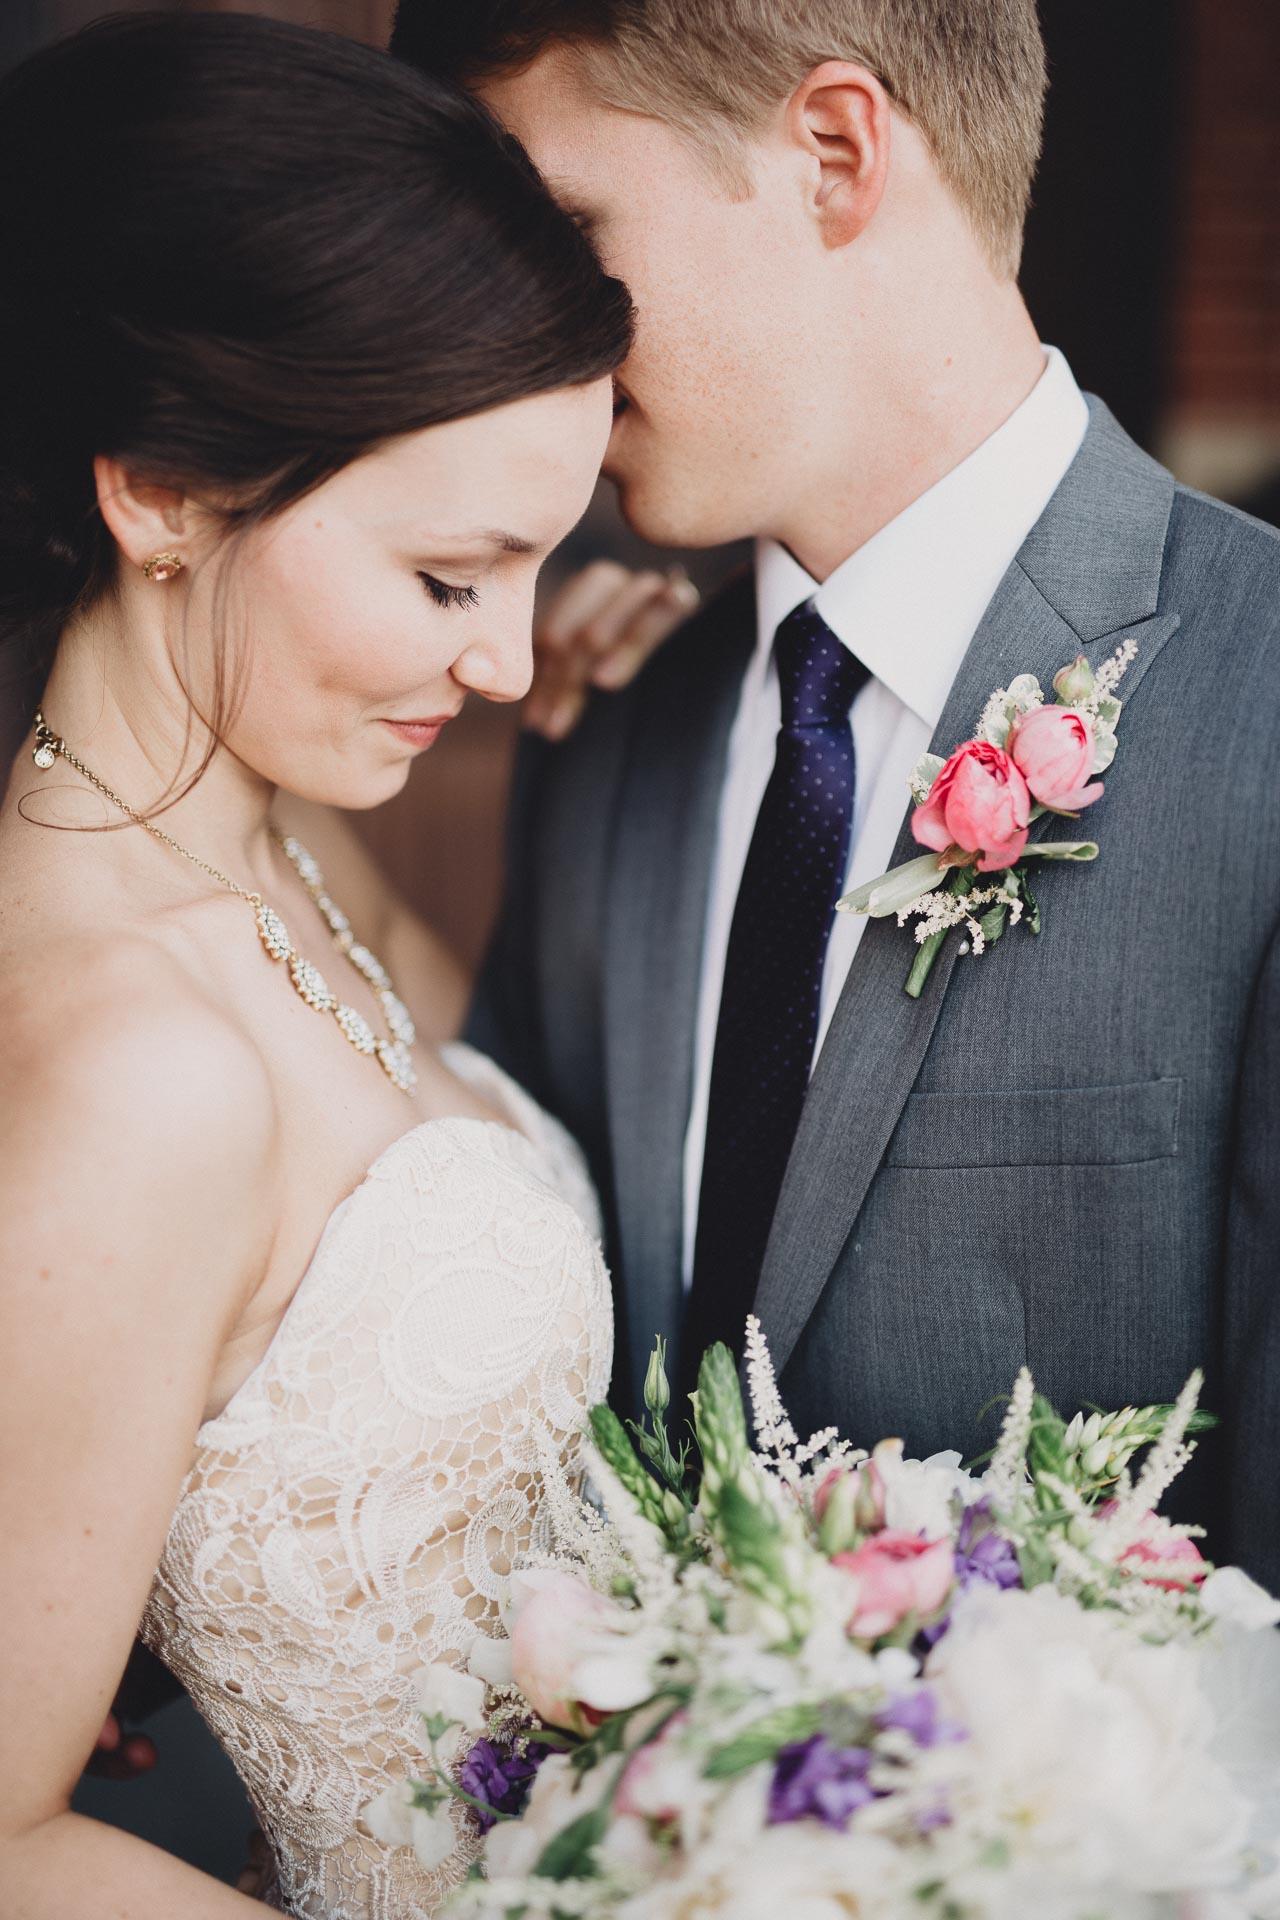 Julia-Michael-Cincinnati-Music-Hall-Wedding-076@2x.jpg